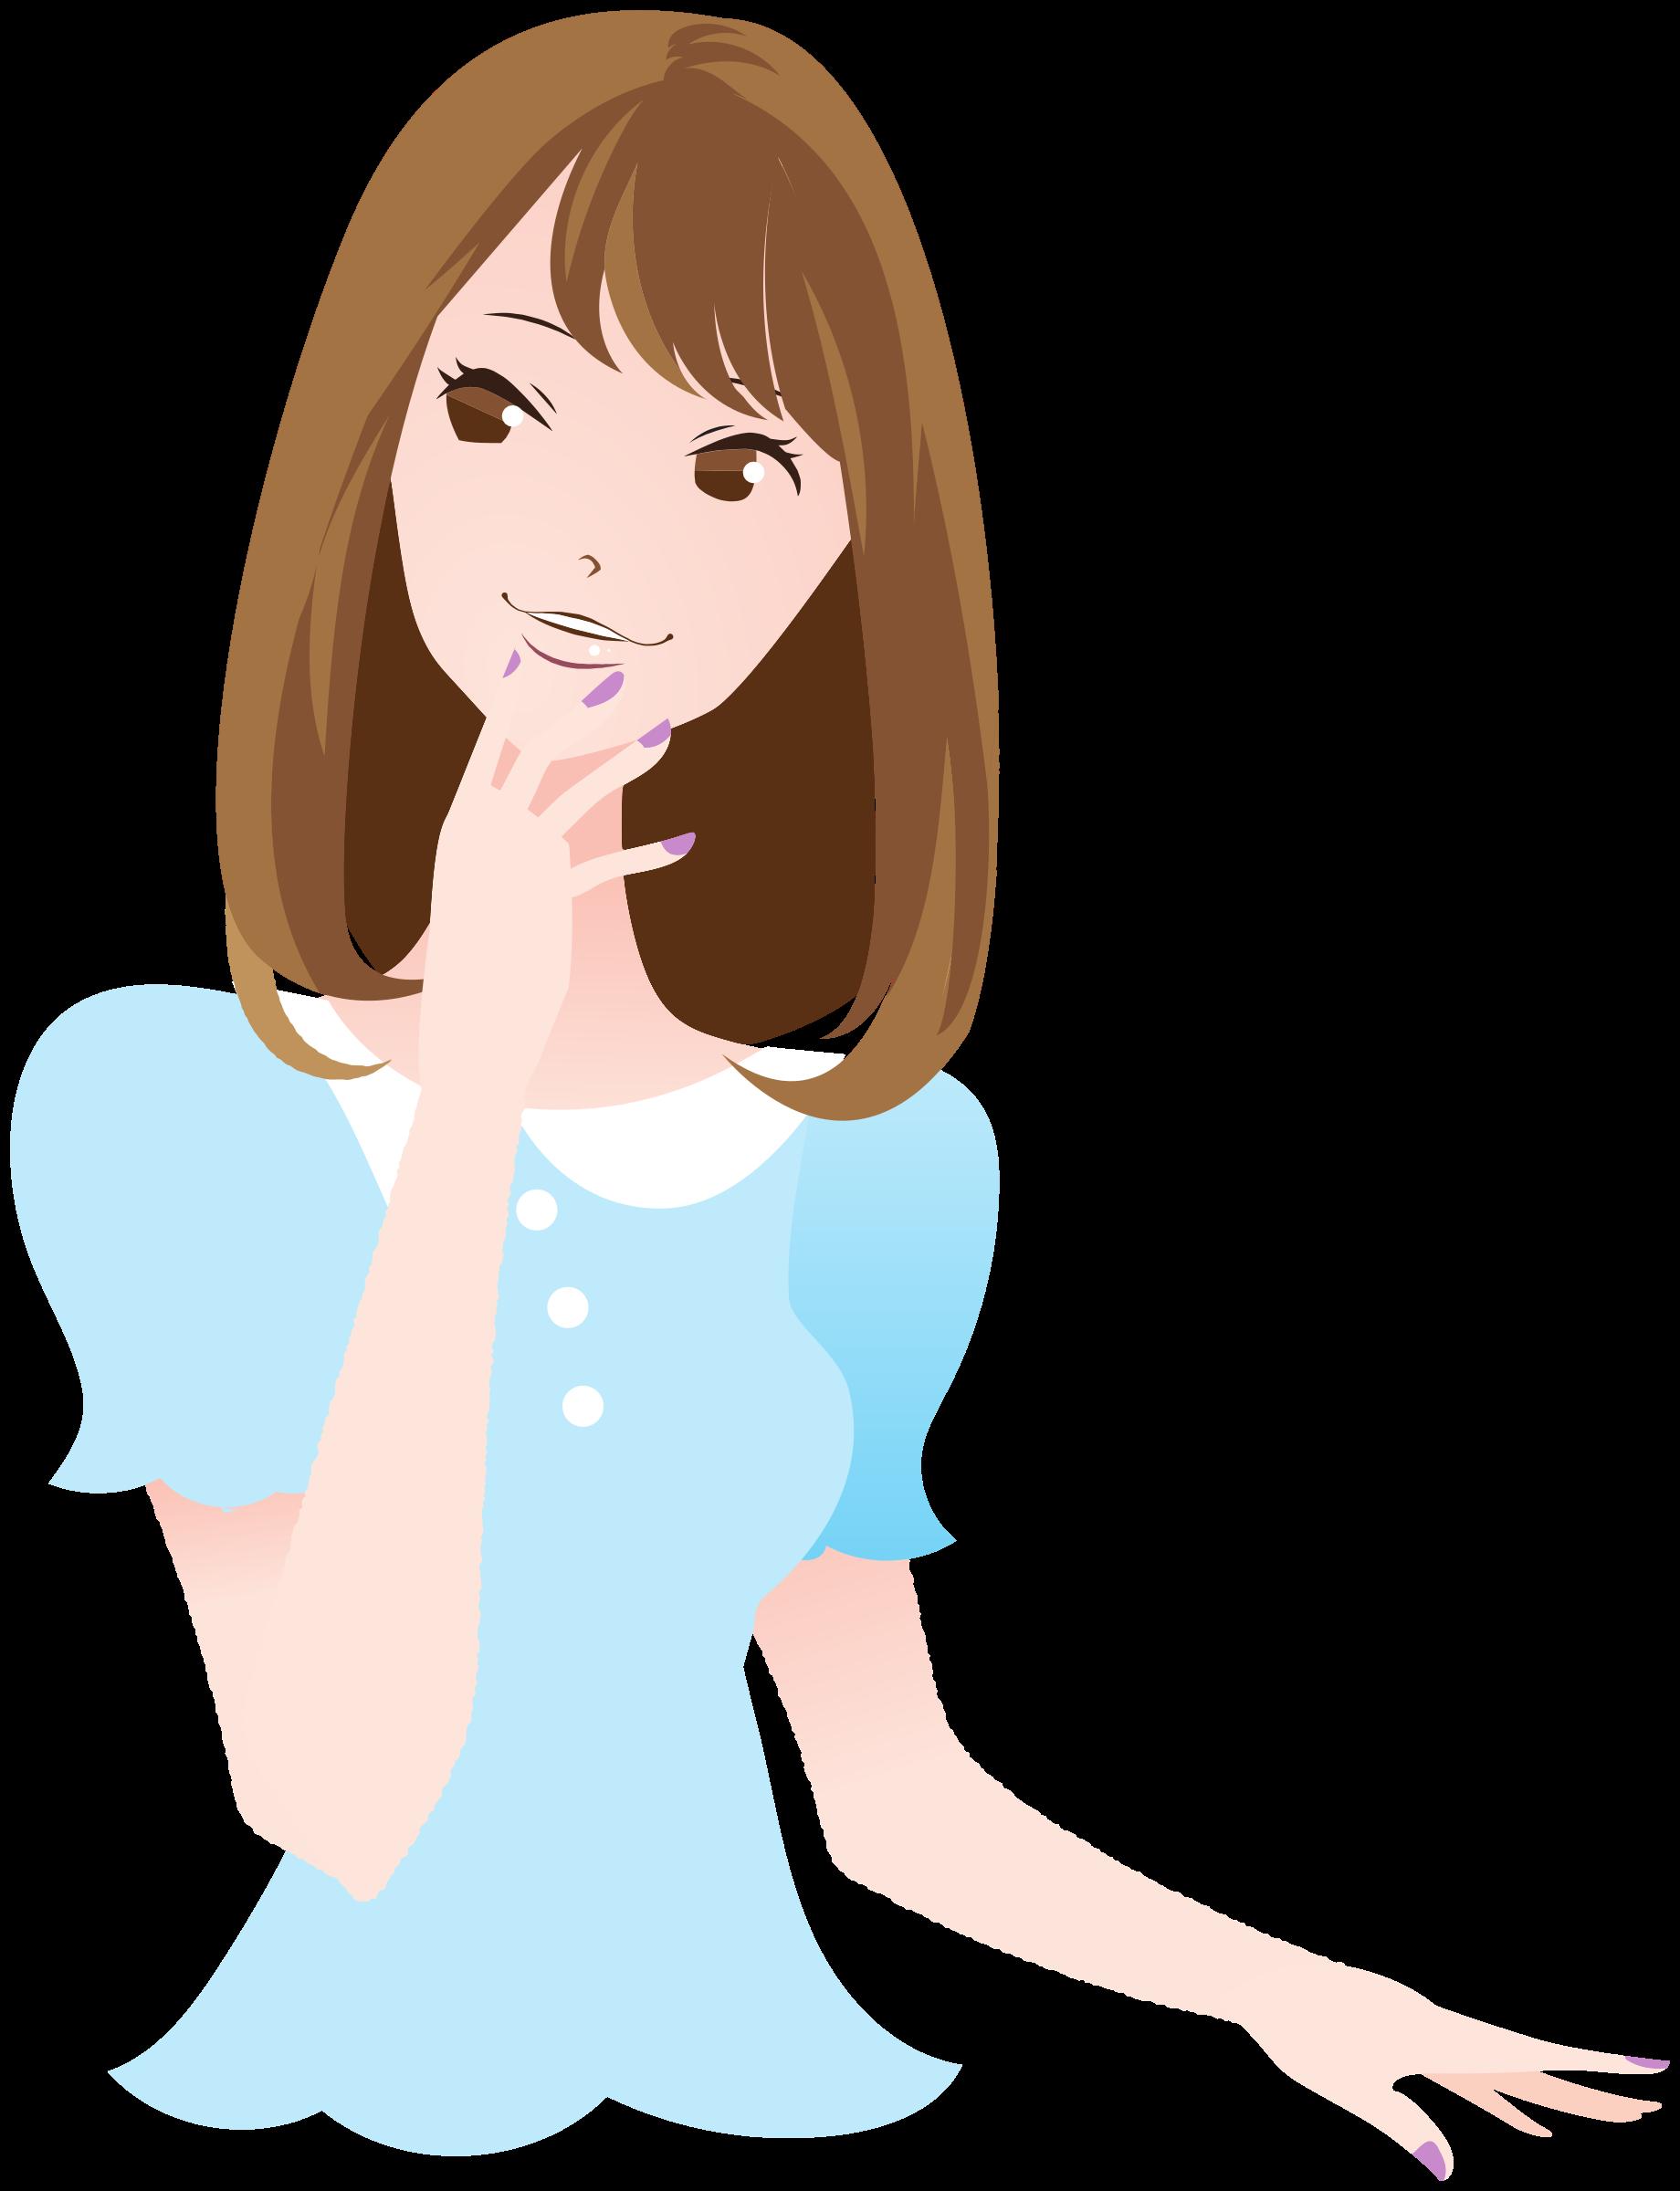 Clipart girl long hair. Beautiful woman big image